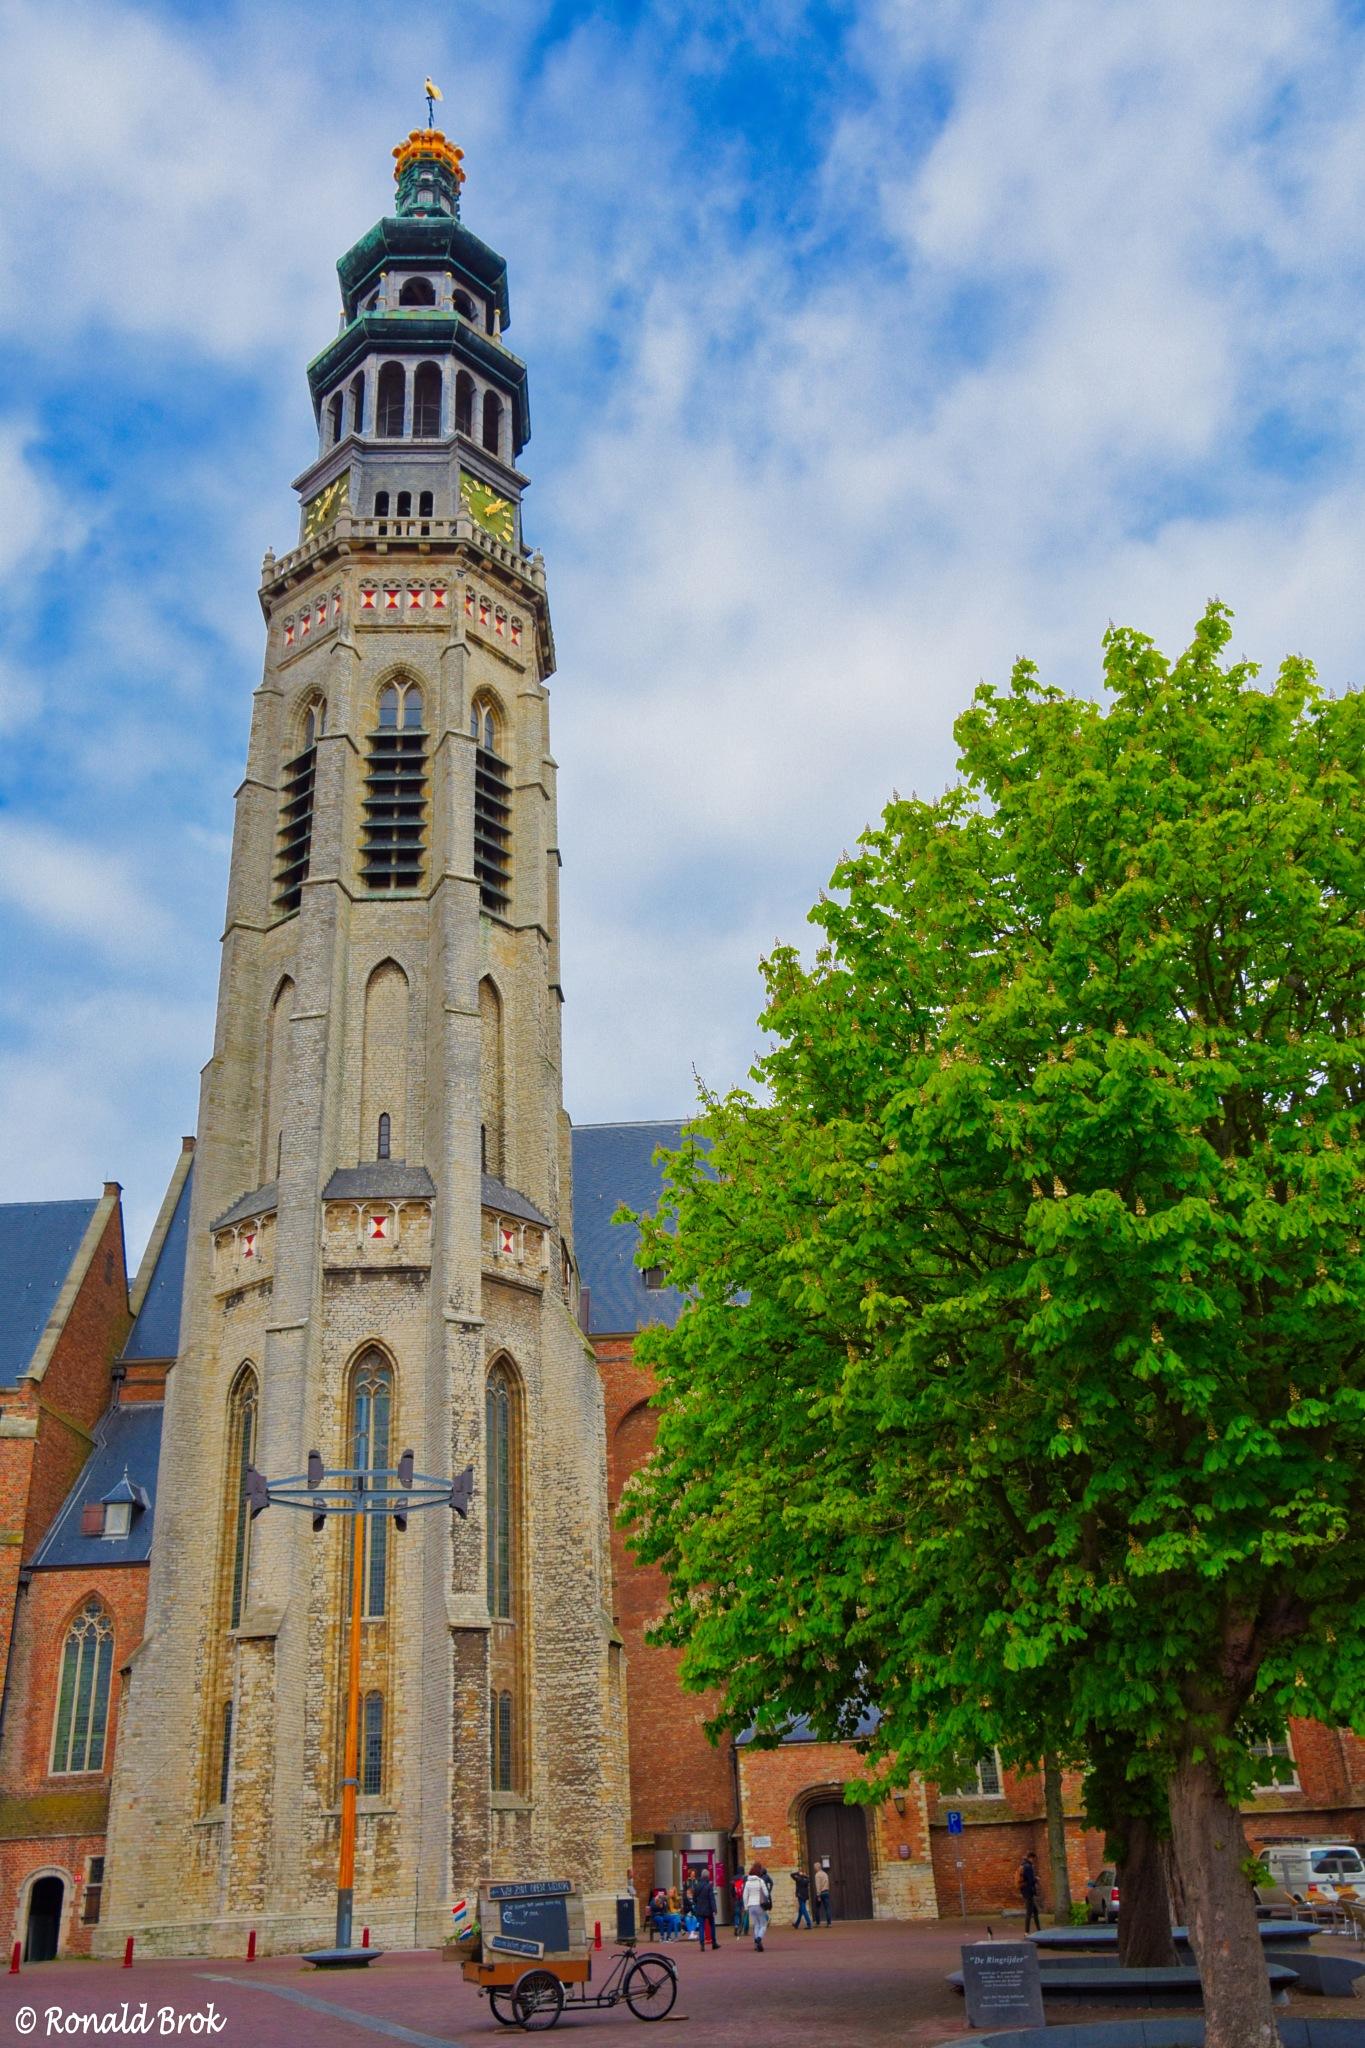 'Lange Jan' in Middelburg, the Netherlands by RonaldBrok